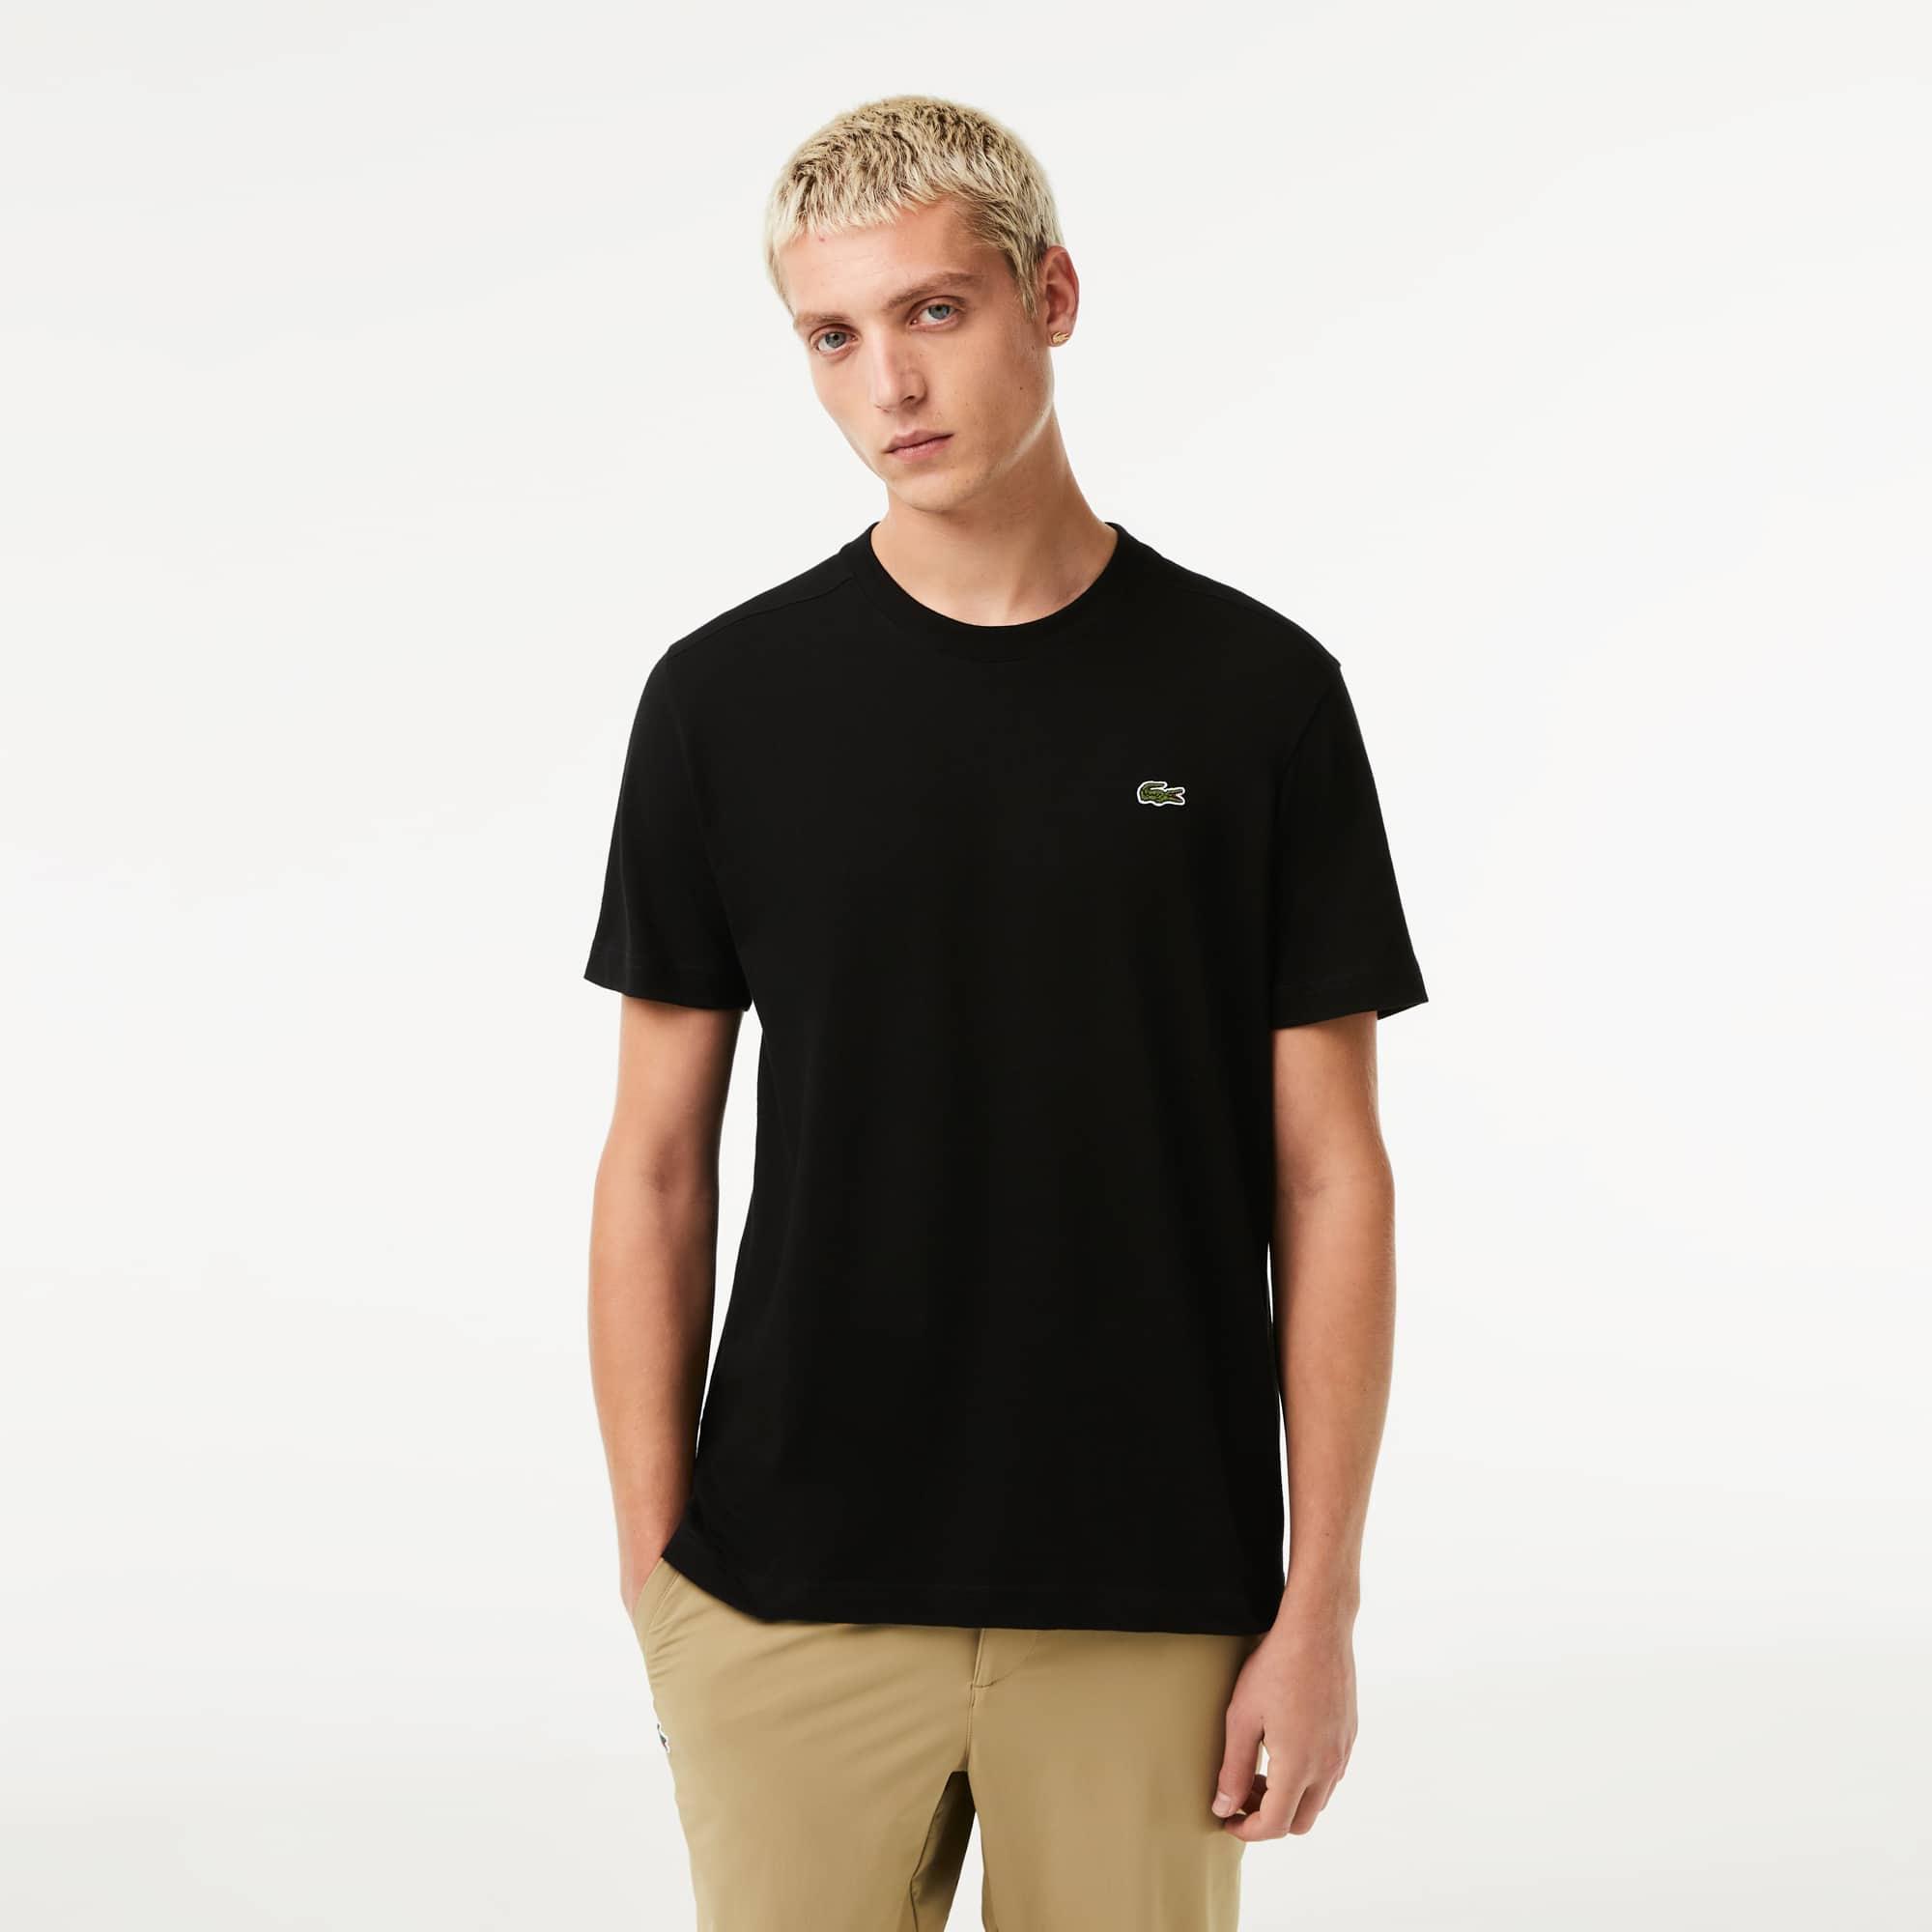 Men's SPORT Crew Neck Technical Cotton Tennis T-Shirt